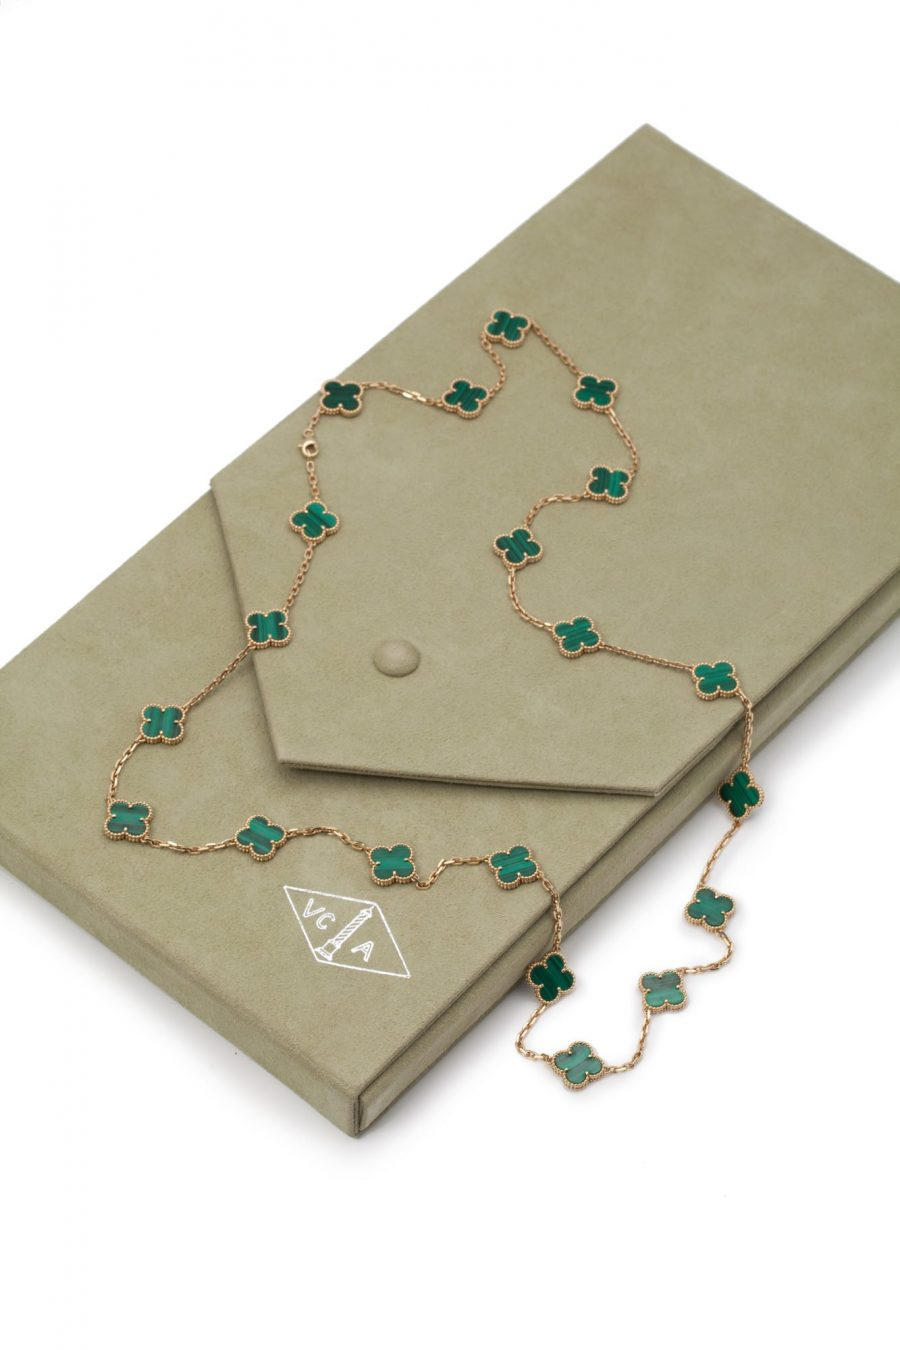 alhambra malachiet van cleef & arpels